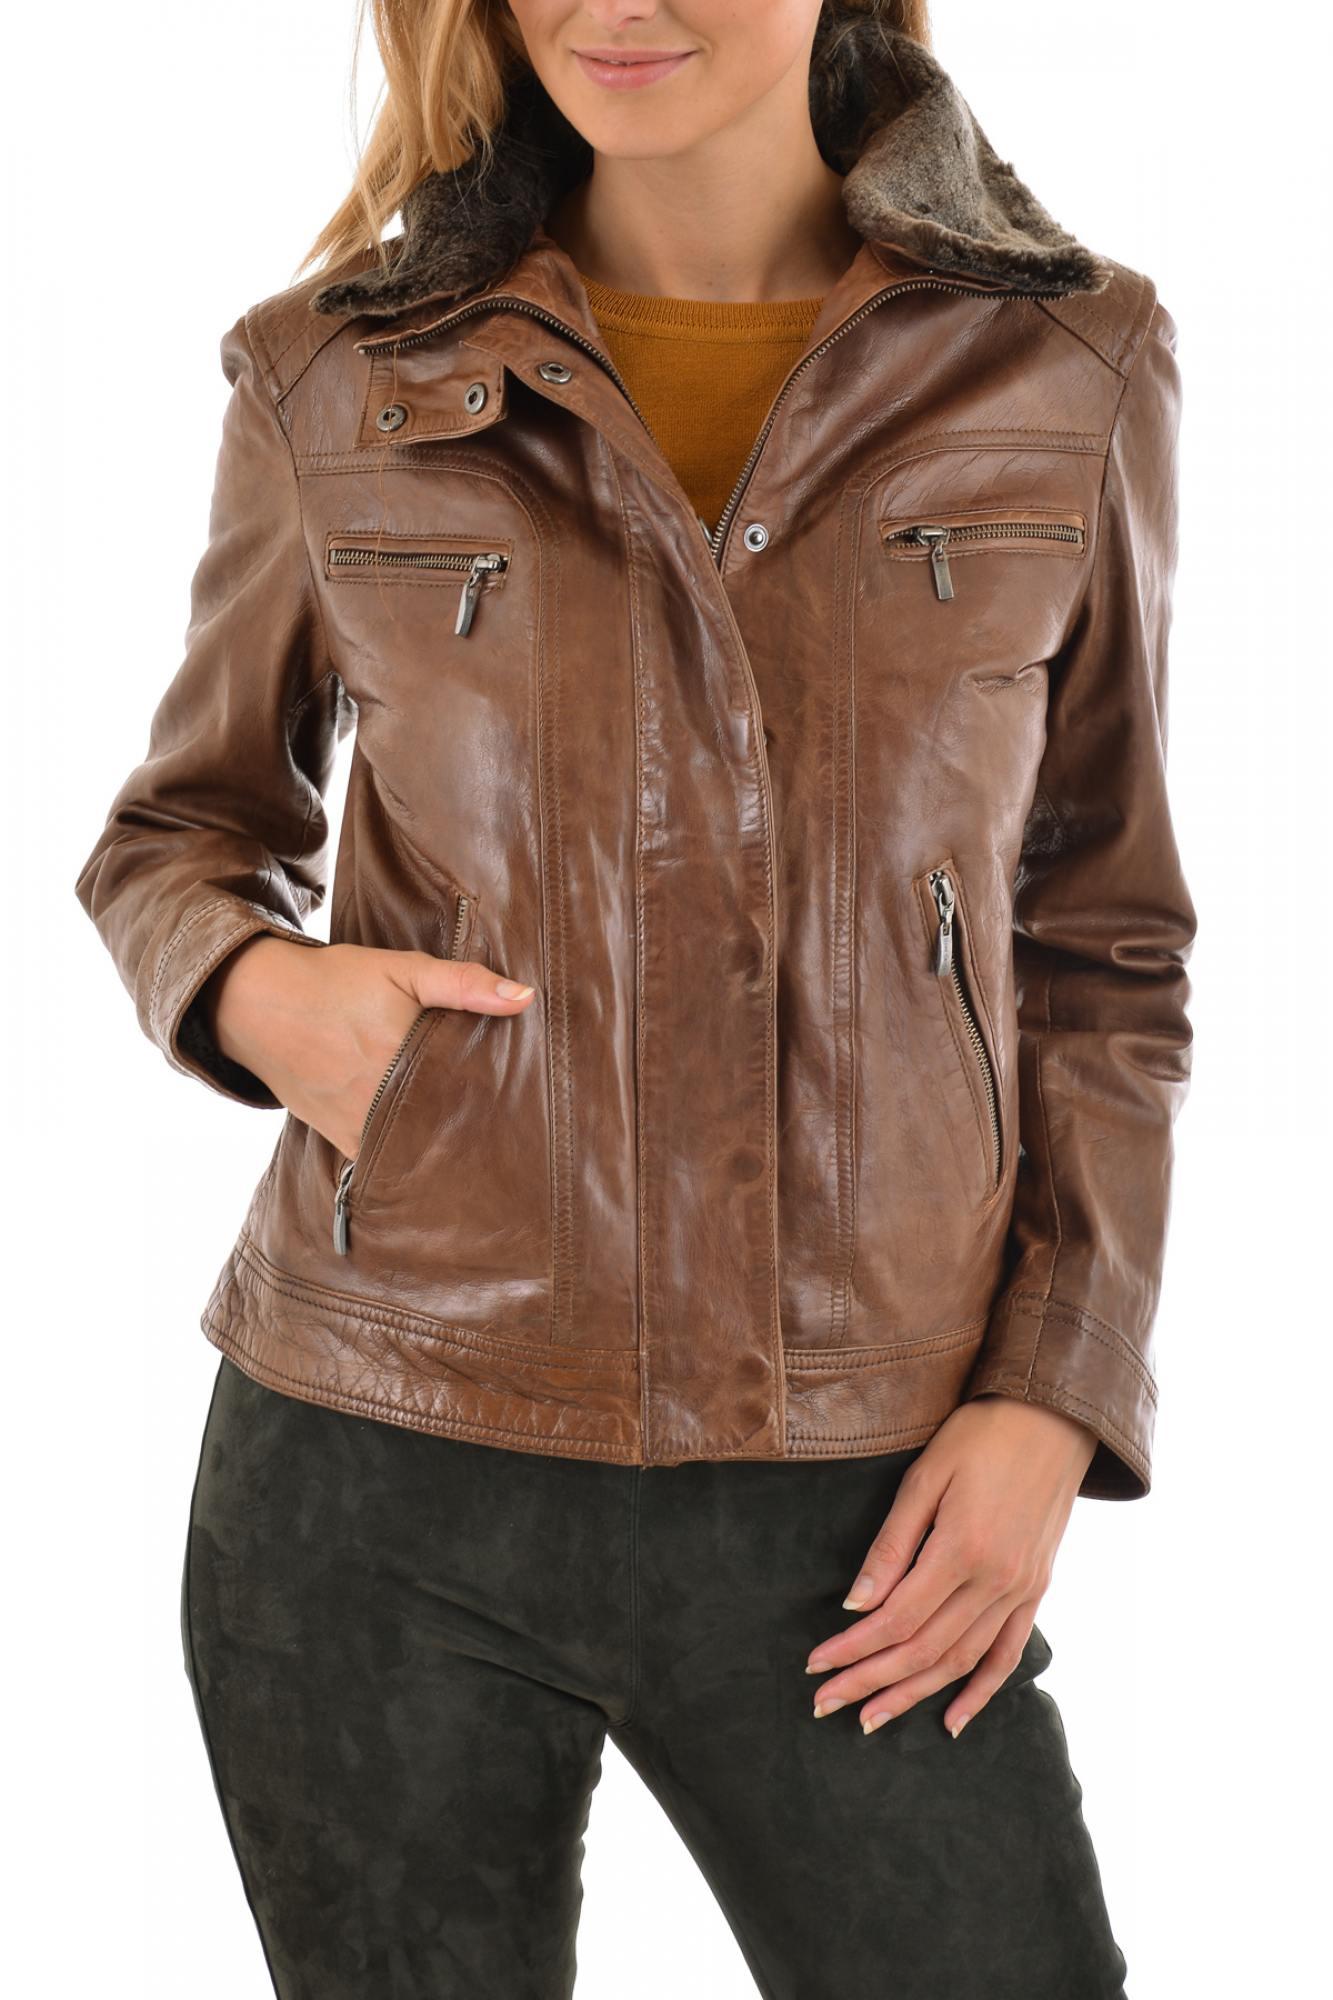 Veste cuir marron femme solde